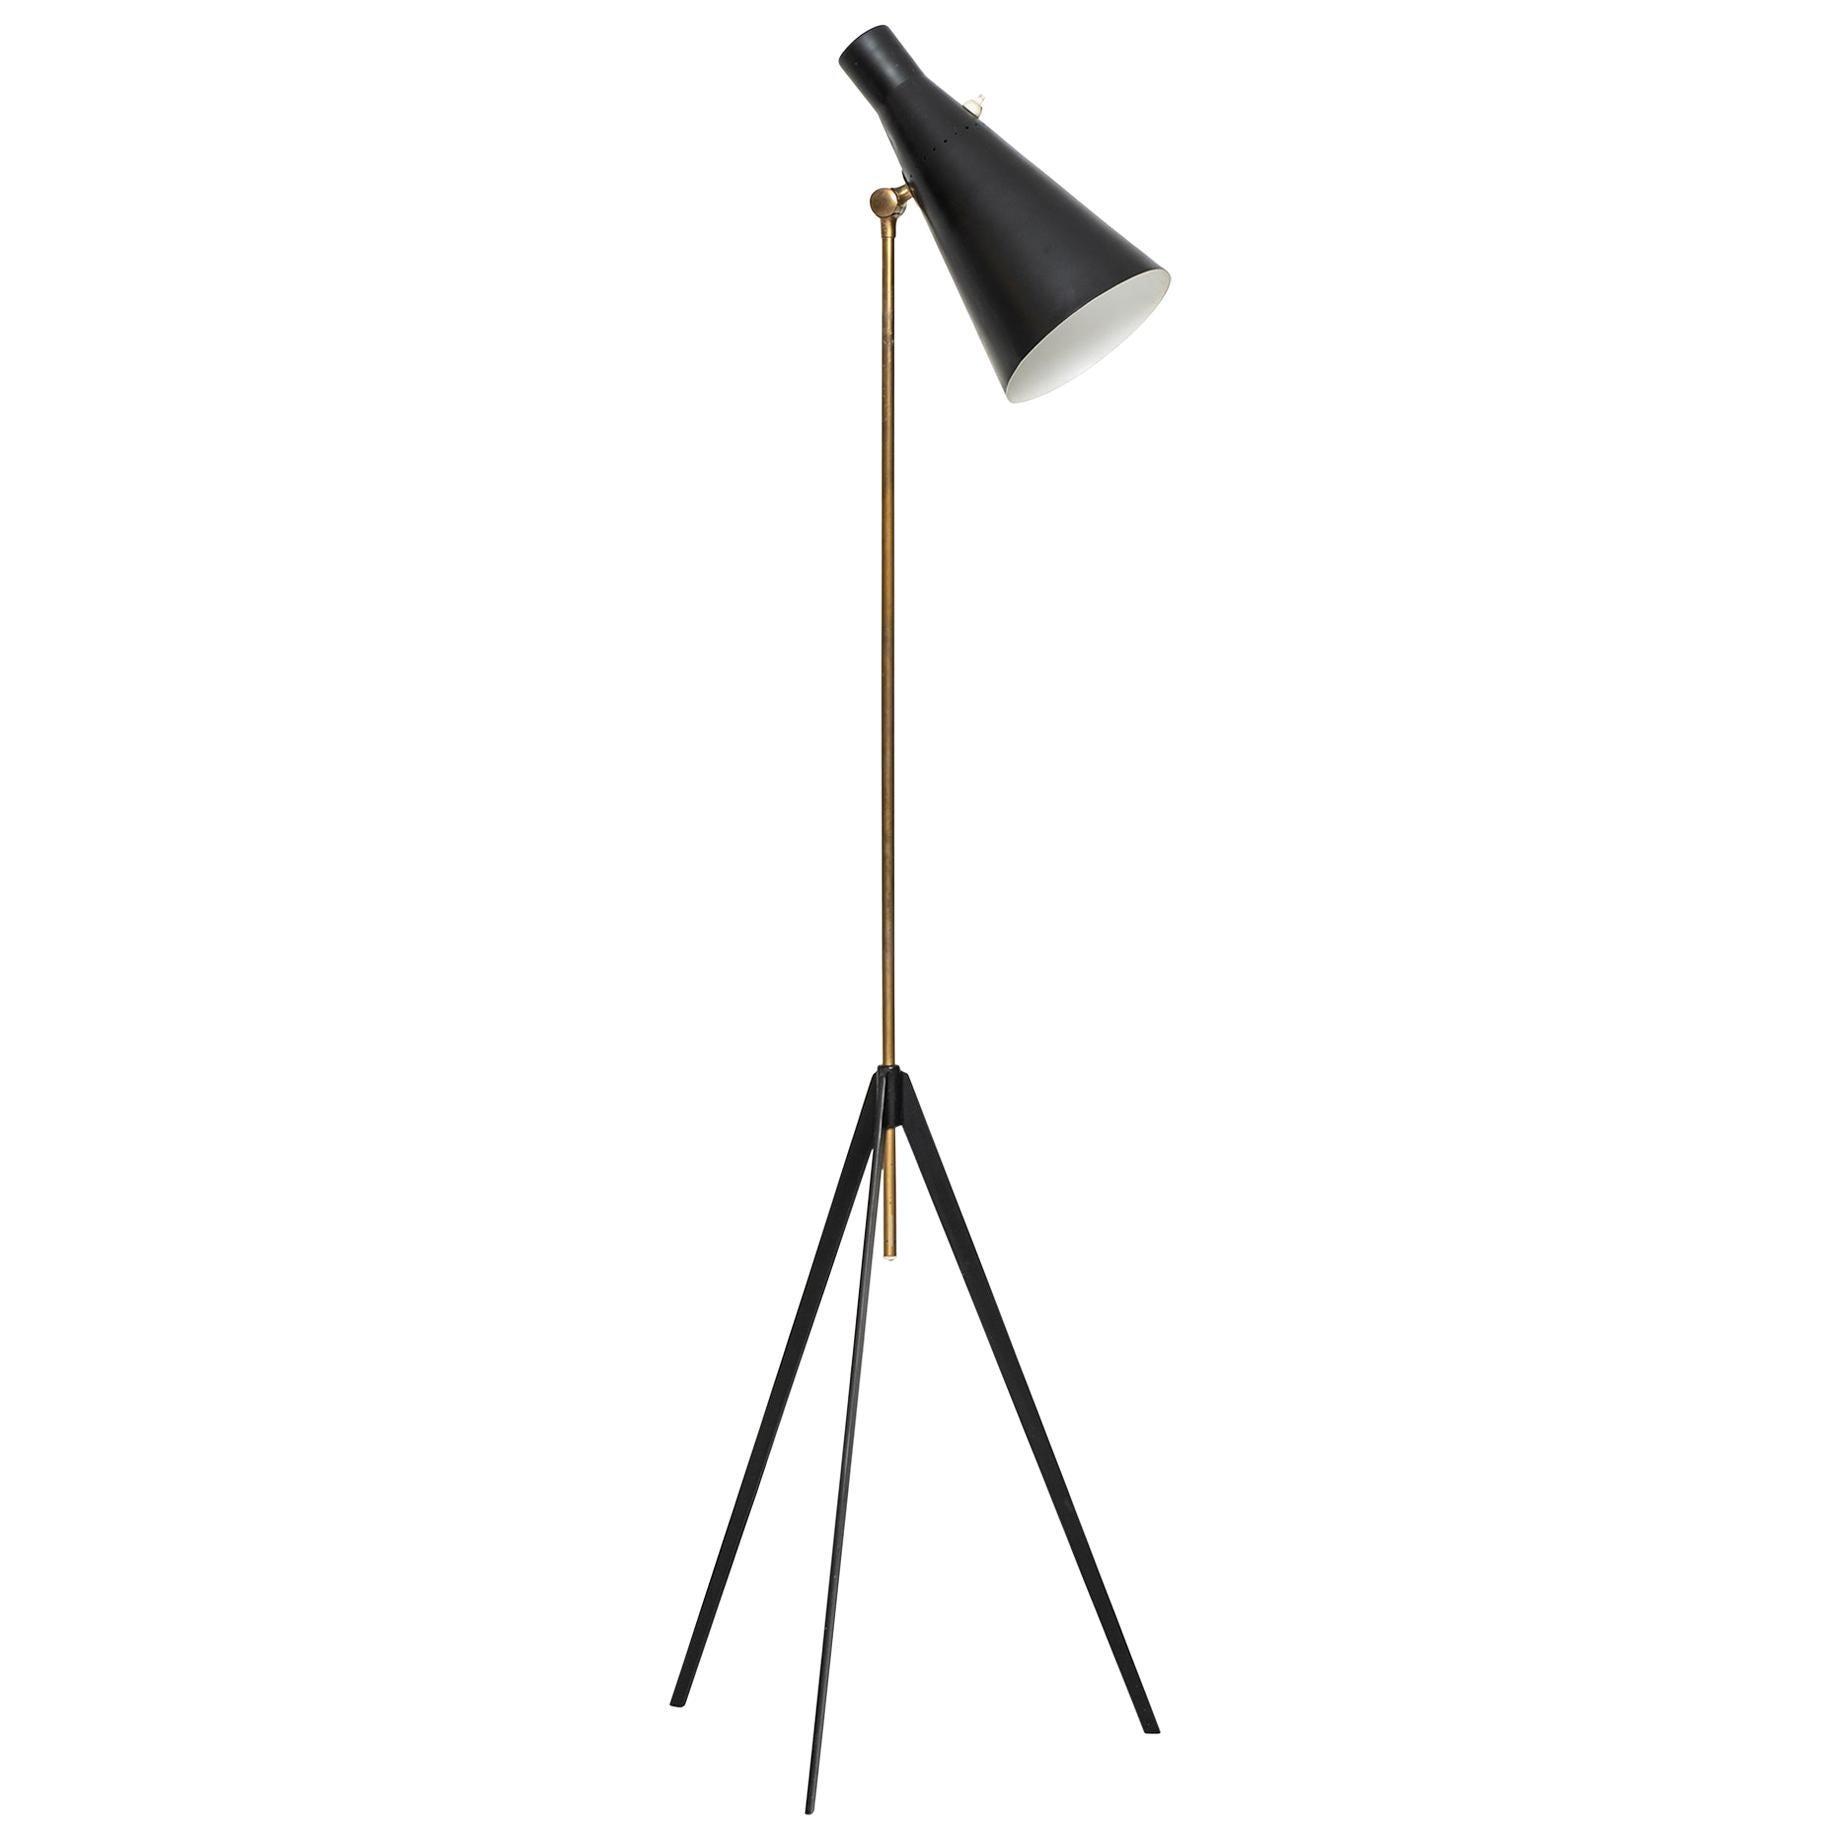 Alf Svensson Floor Lamp Model G-36 Produced by Bergbom in Sweden